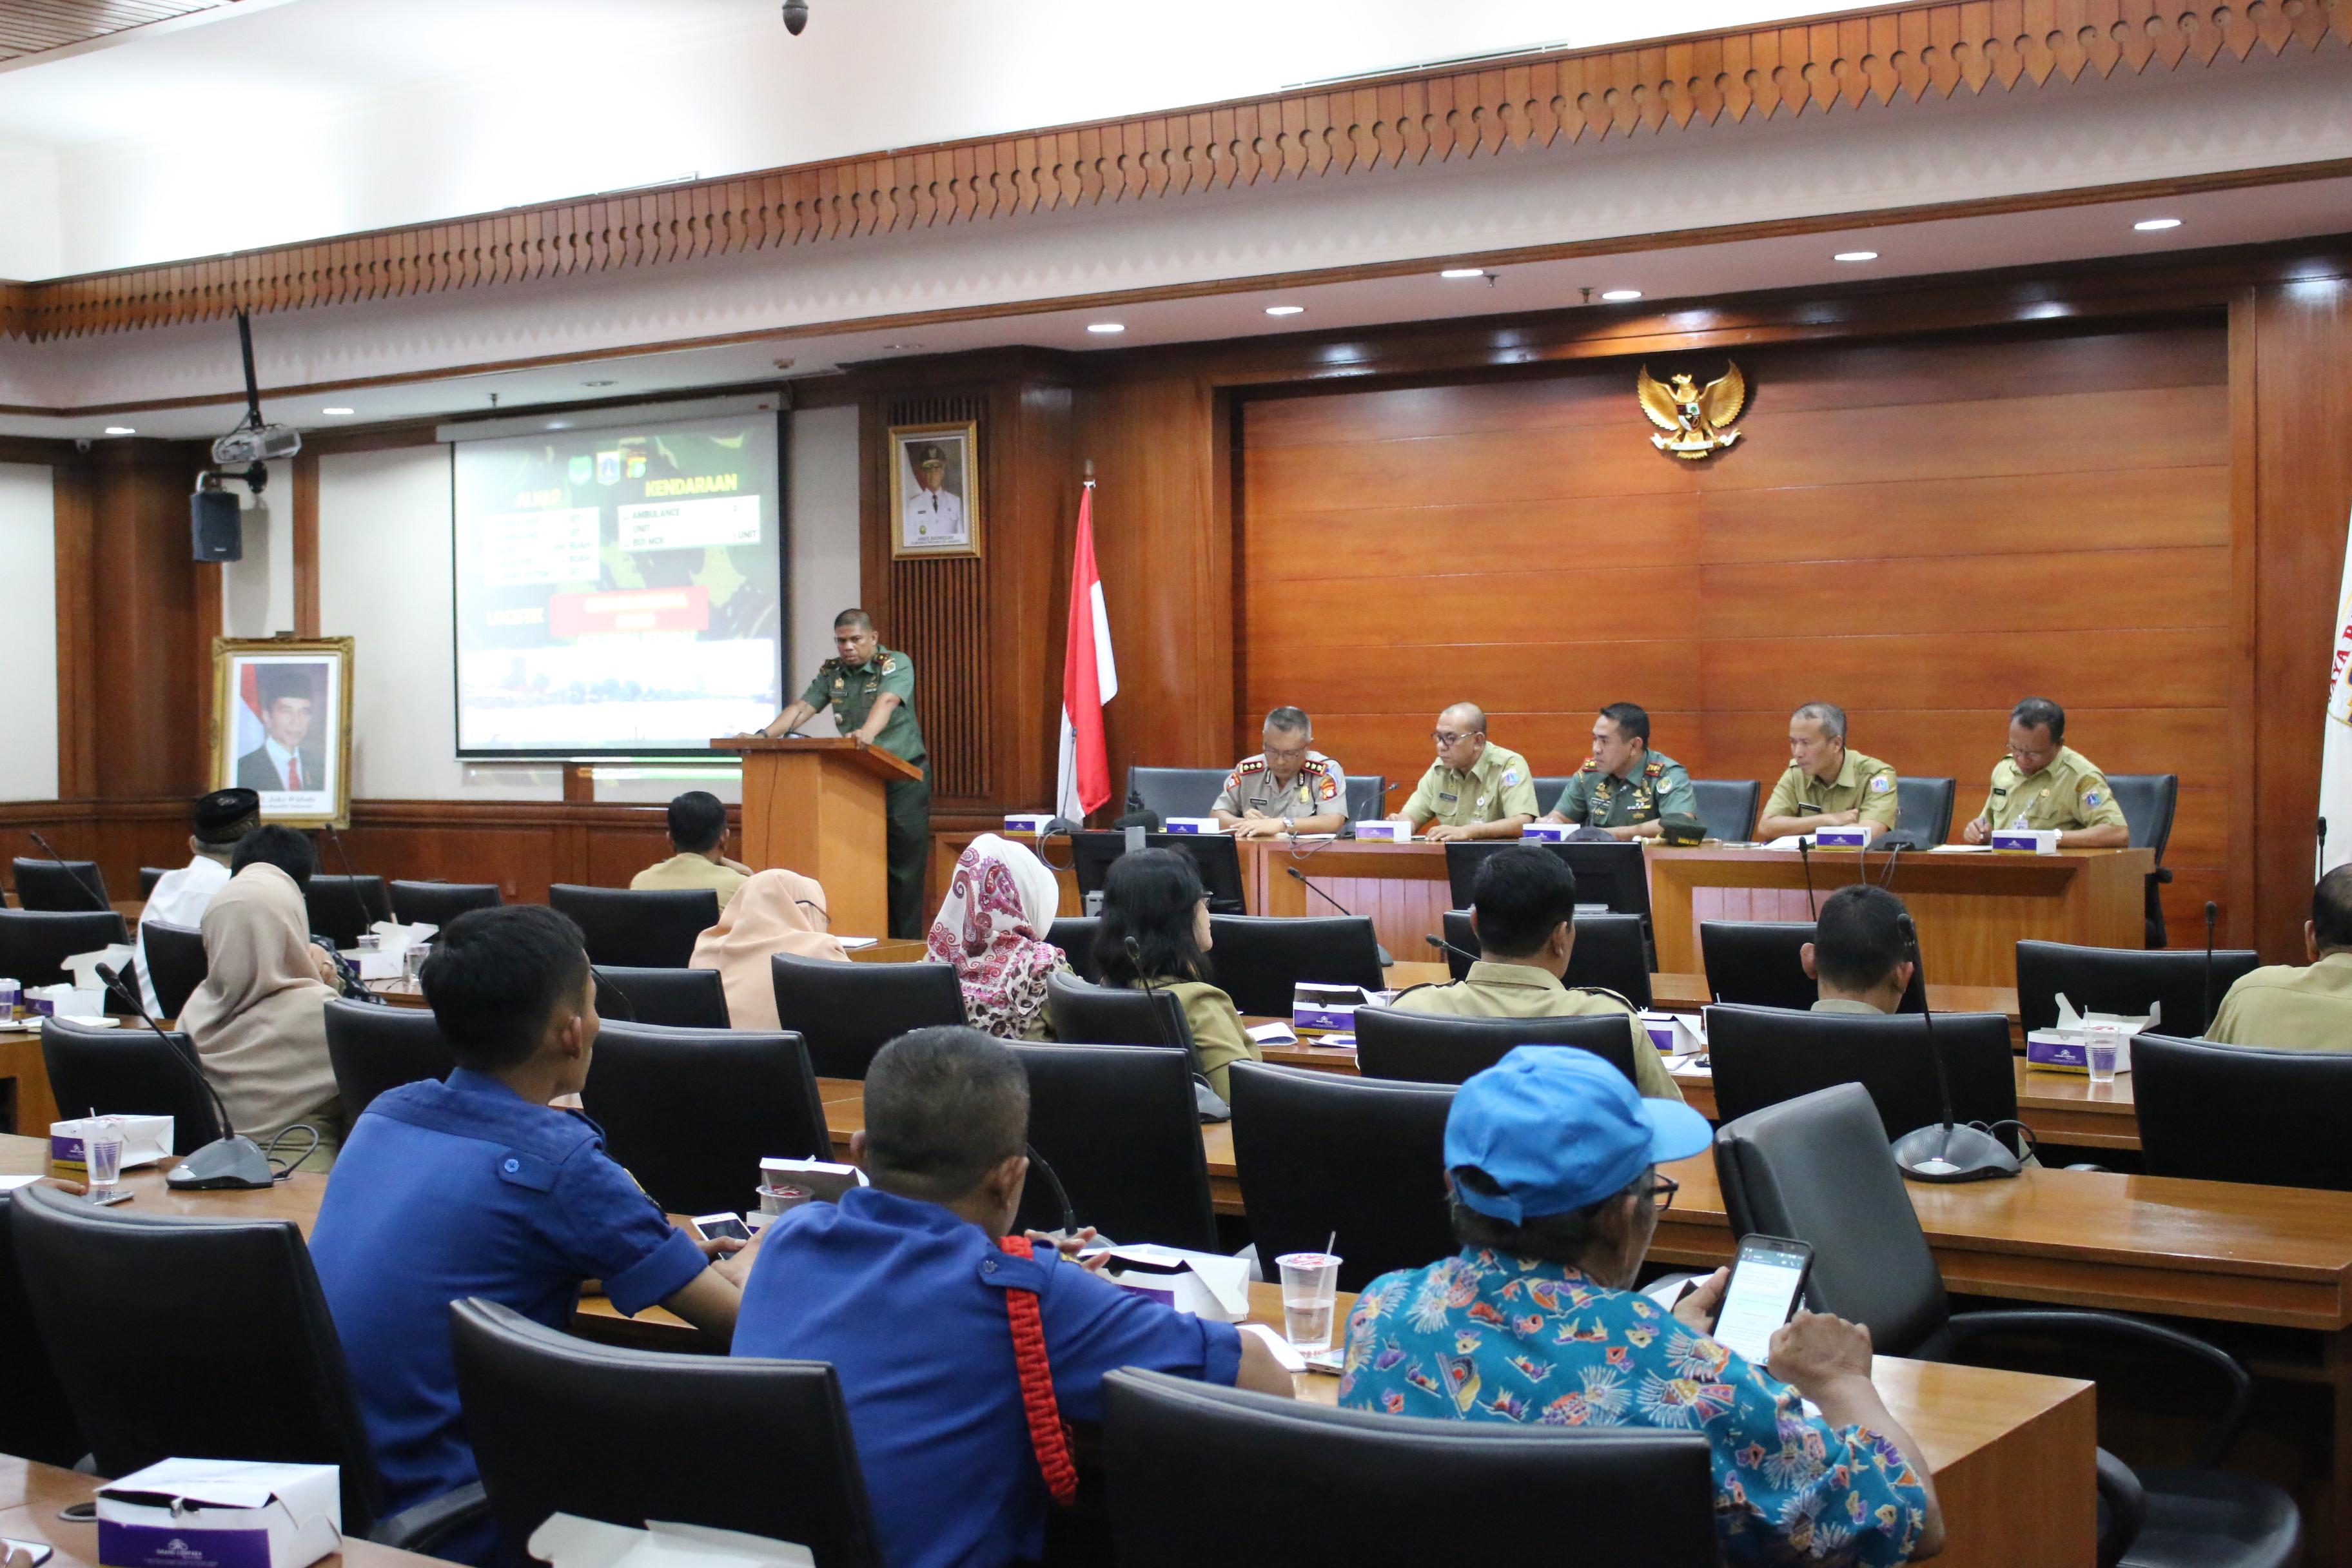 Pemerintah Kota Administrasi Jakarta Utara Hbkb Peringatan Hari Kesaktian Pancasila